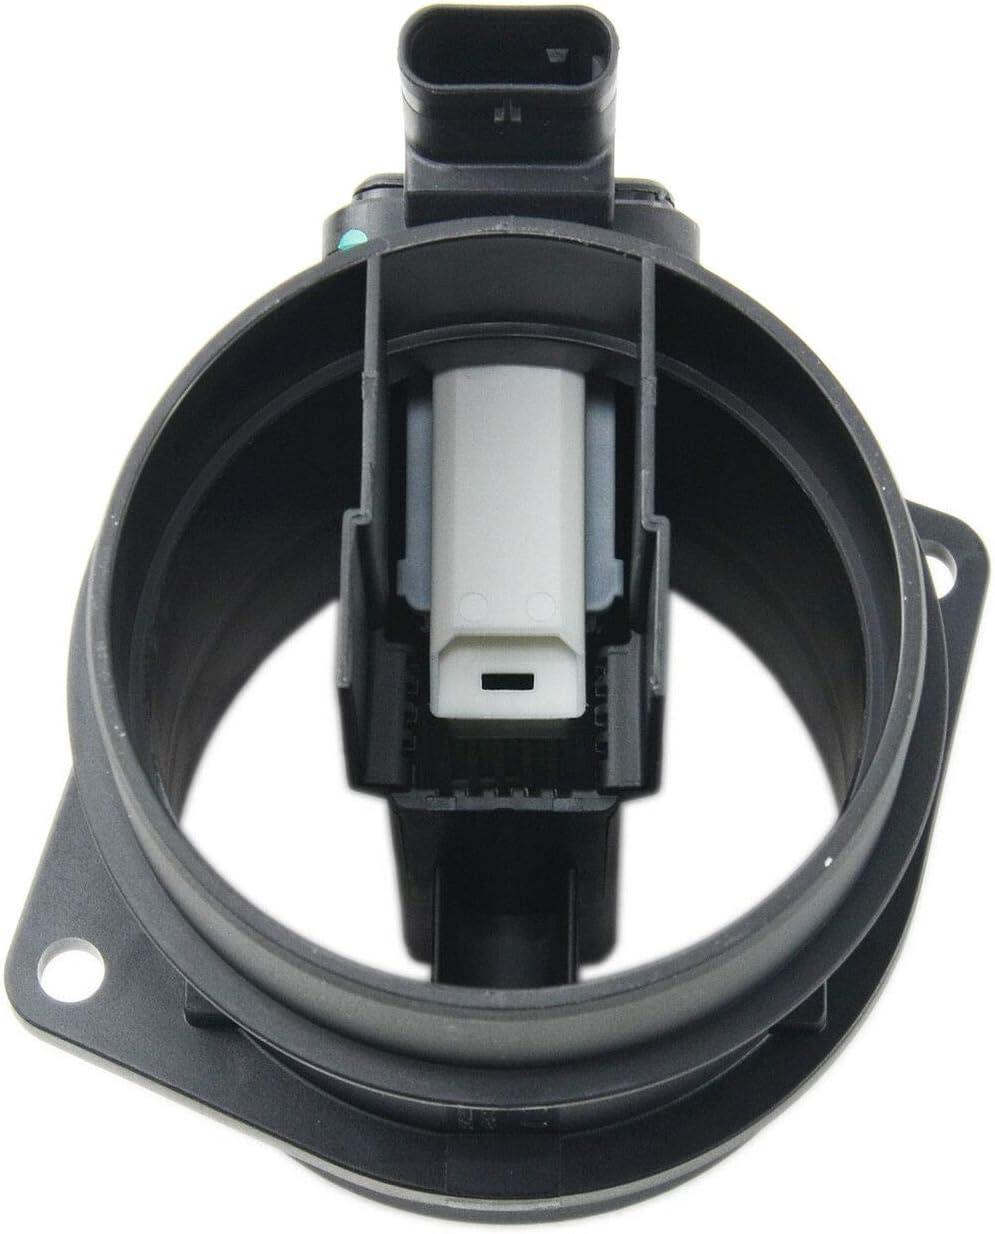 Mass Air Flow Meter Sensor For Jeep Grand Cherokee 3.0 For Mercedes Benz 5WK97917 6510900148 6510900248